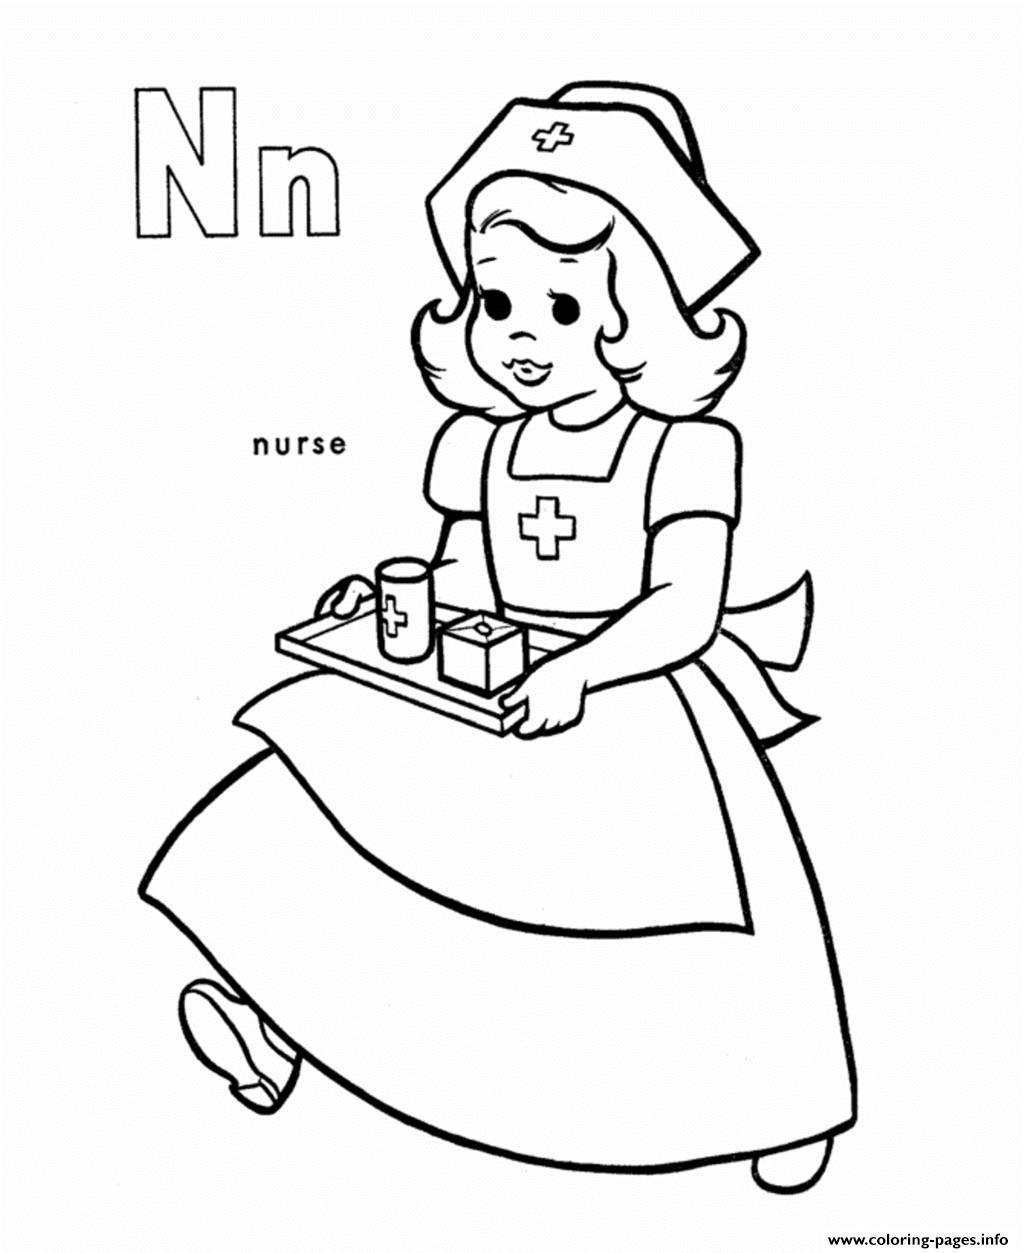 free alphabet s n is nurse26bd coloring pages printable